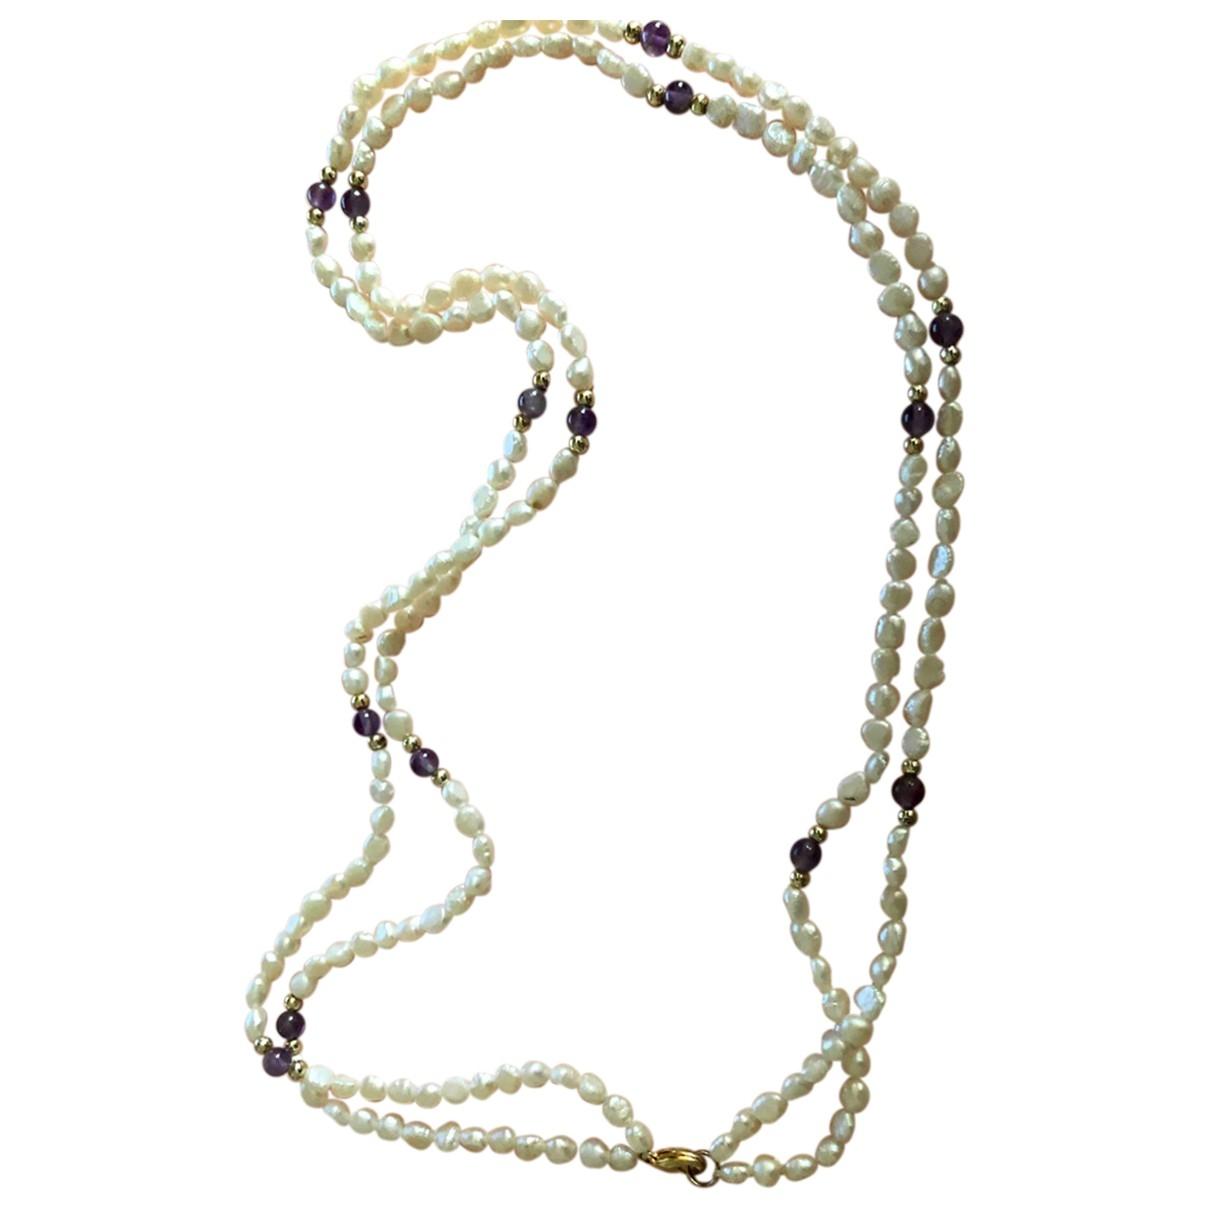 Non Signe / Unsigned Amethyste Kette in  Silber Perlen